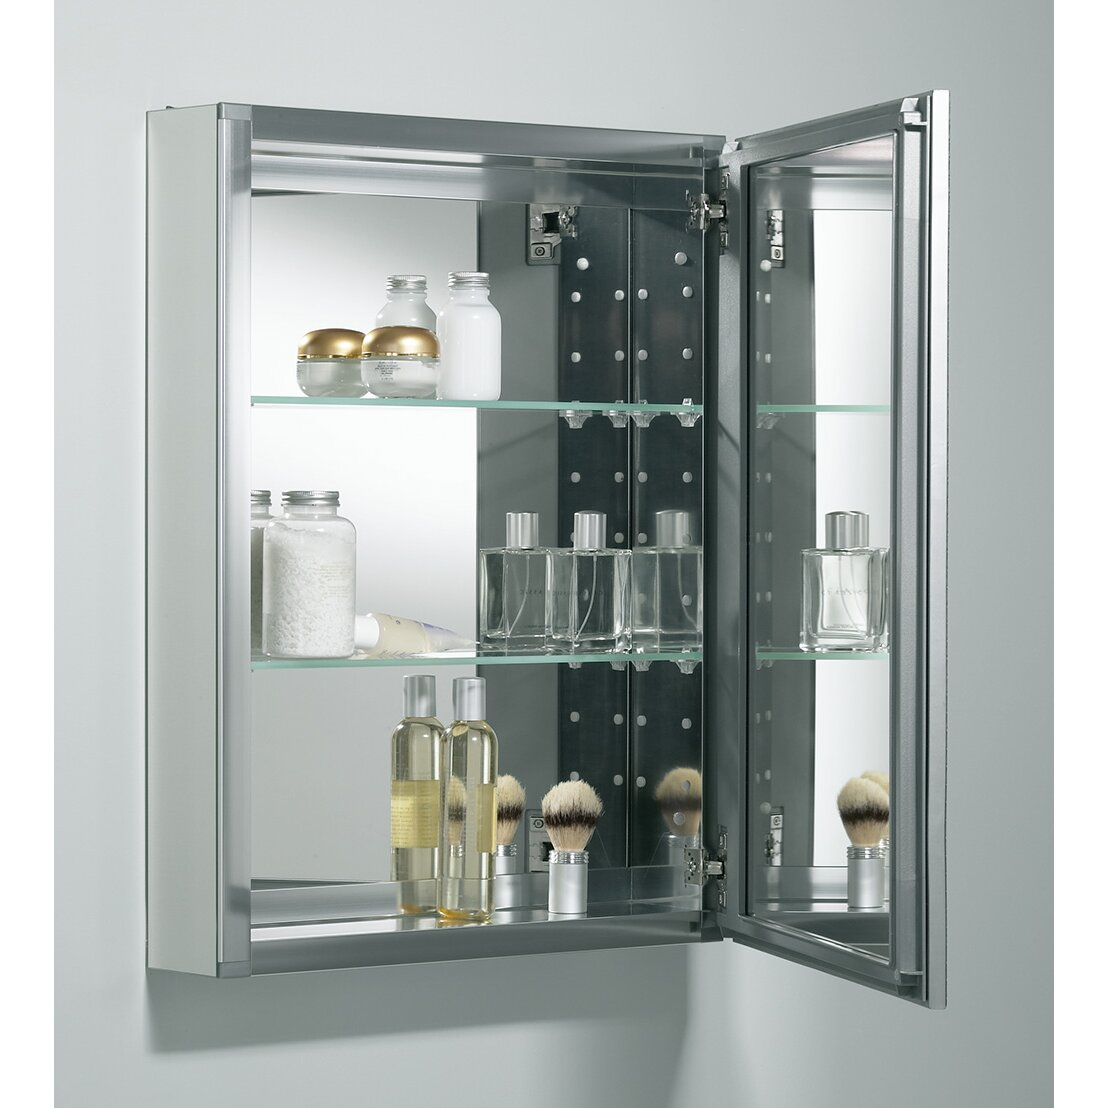 Kohler 20 x 26 aluminum mirrored medicine cabinet for Medicine cabinets